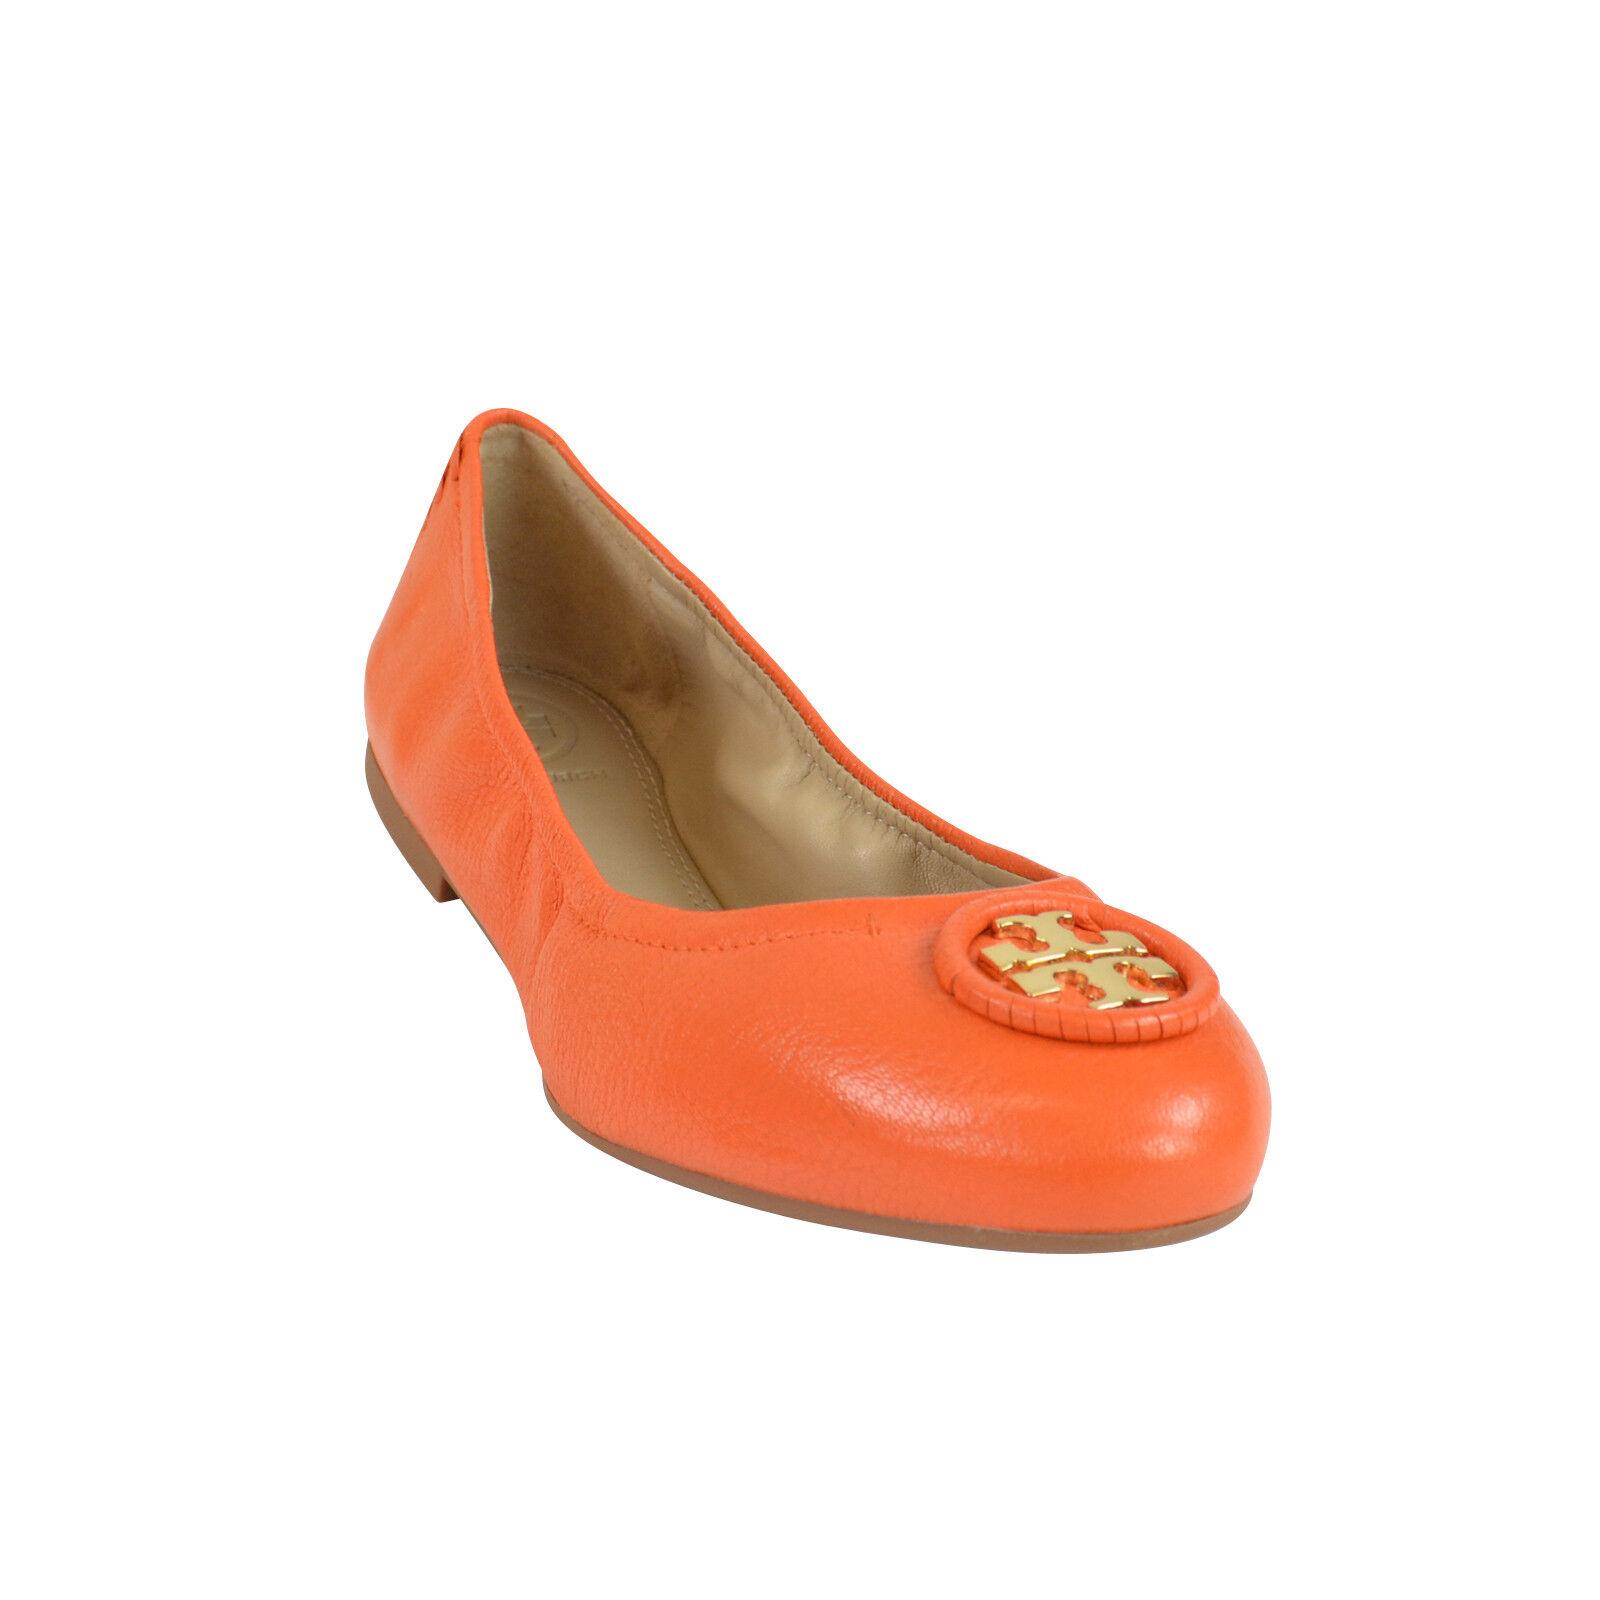 NIB Tory Burch ALLIE Wrapped Logo Ballet Flats Schuhes in Mango Orange 8.5